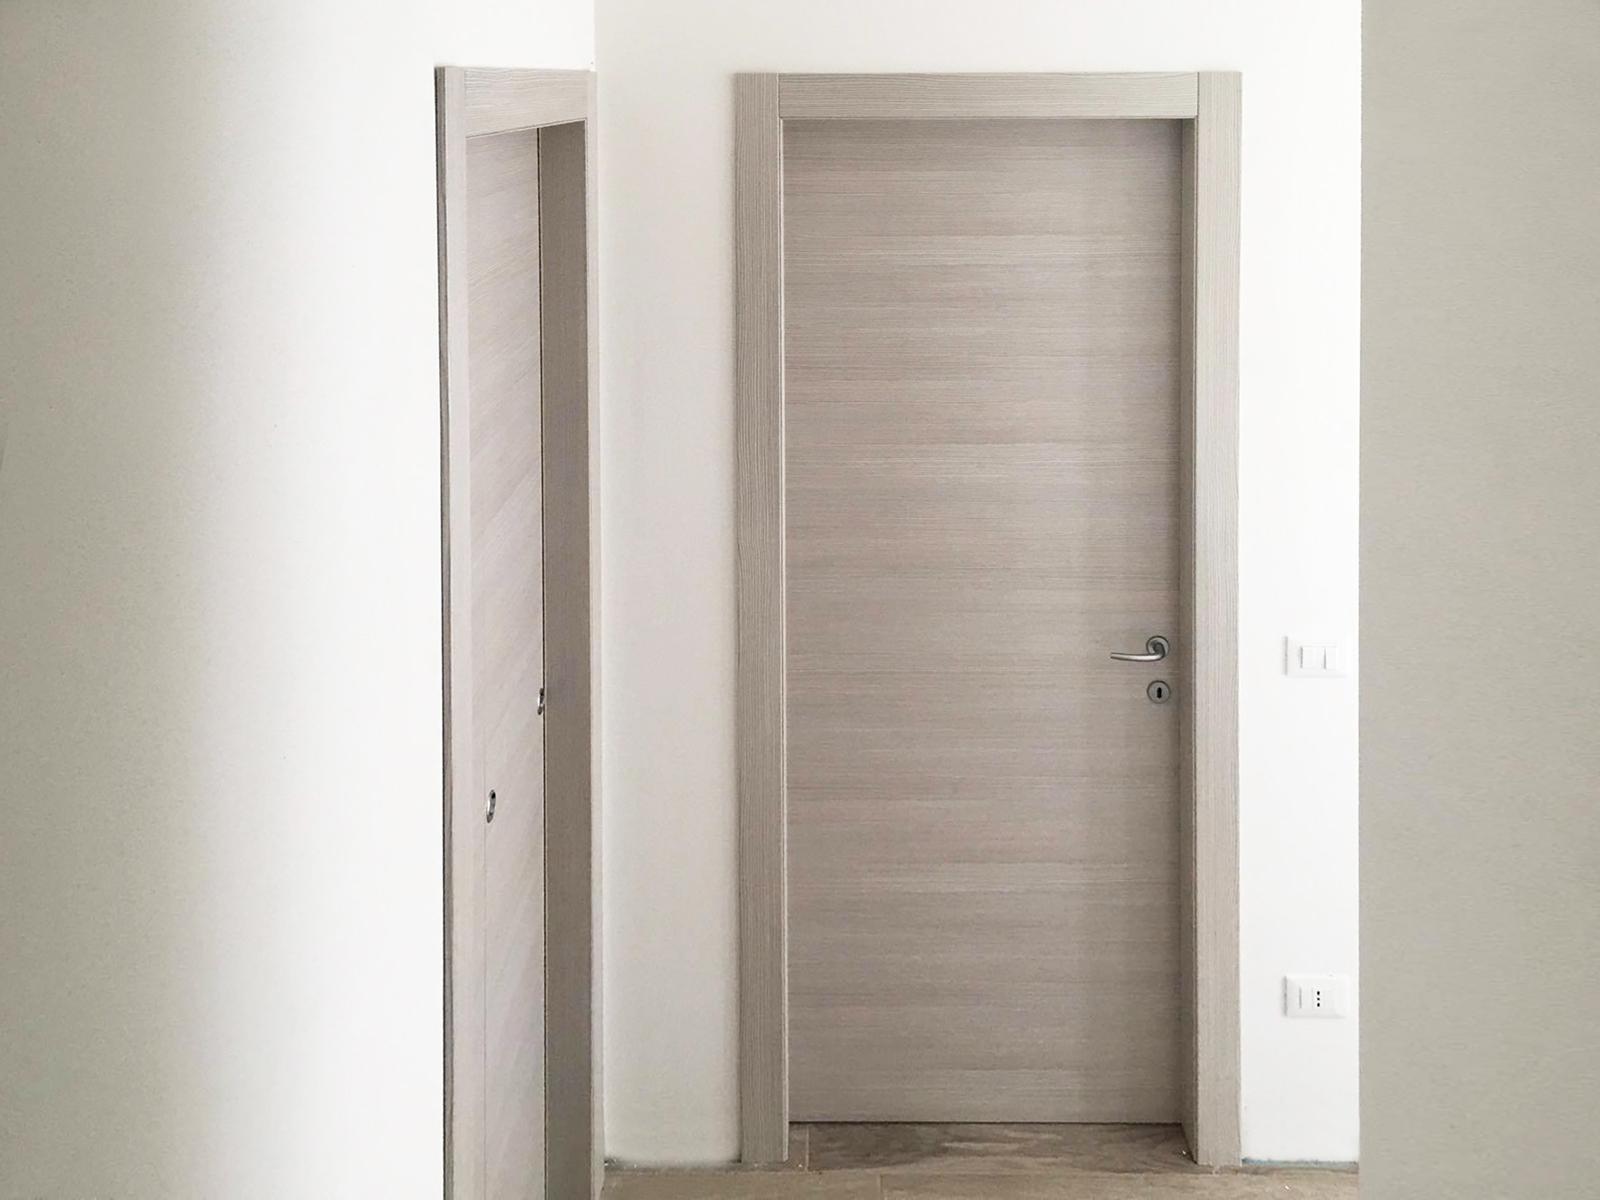 Porte gd dorigo aprire la porta al design con stile - Porte gd dorigo ...